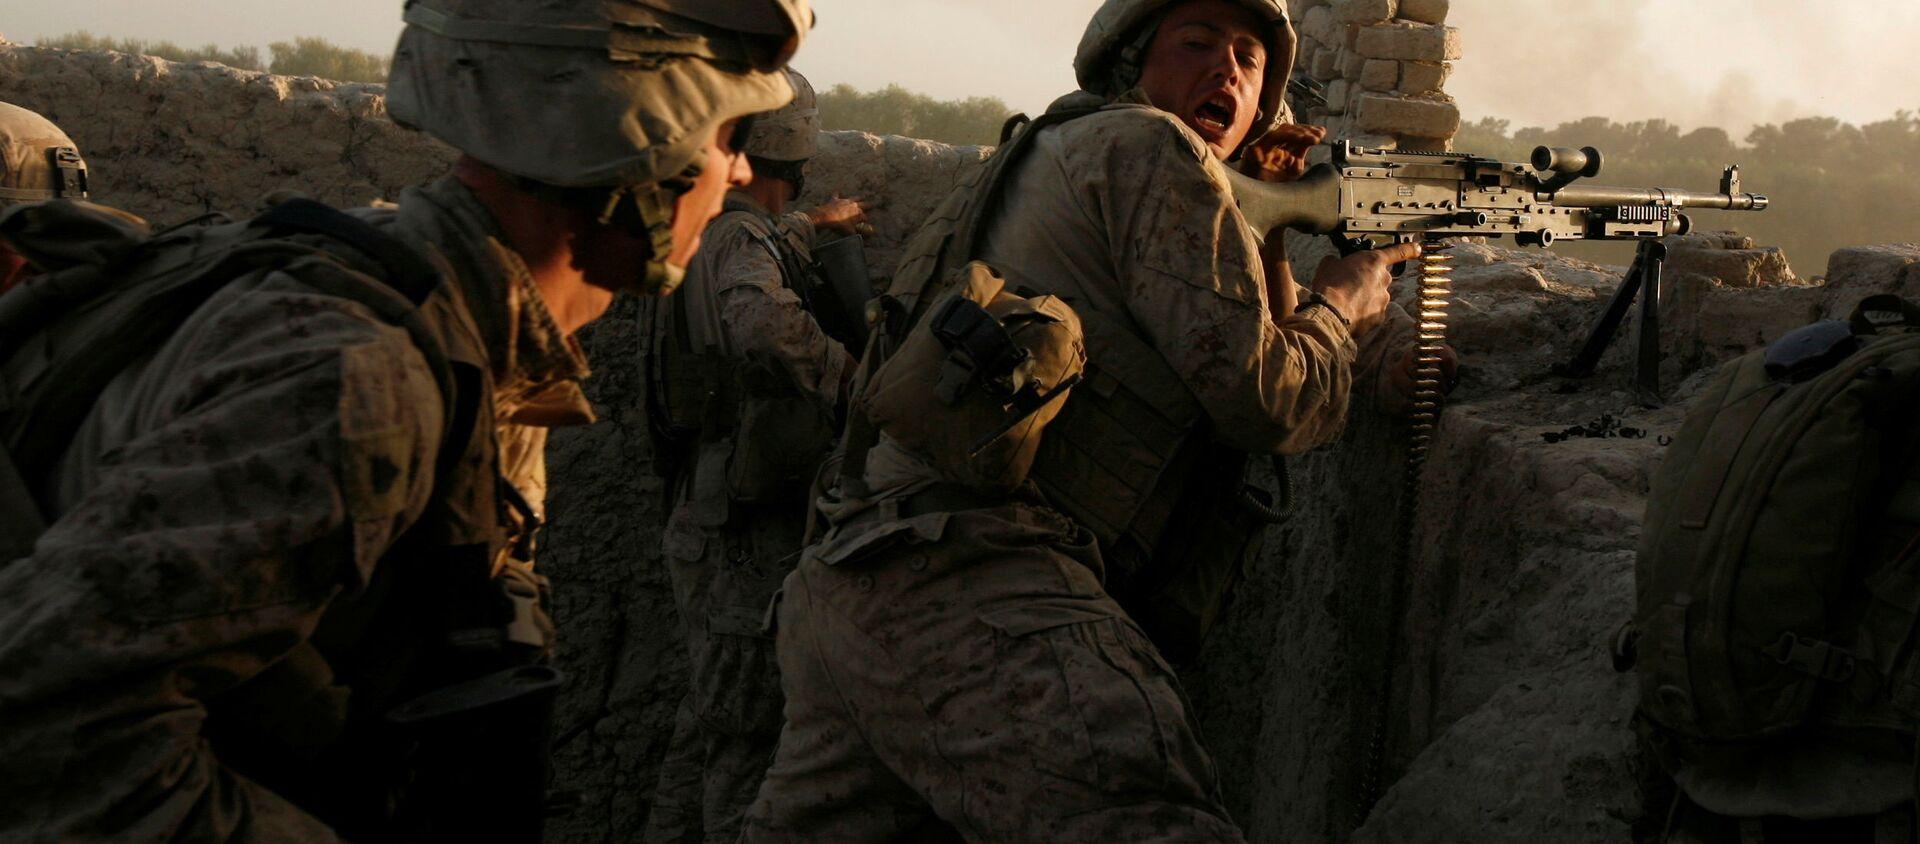 Lính Mỹ ở Afghanistan - Sputnik Việt Nam, 1920, 30.04.2021